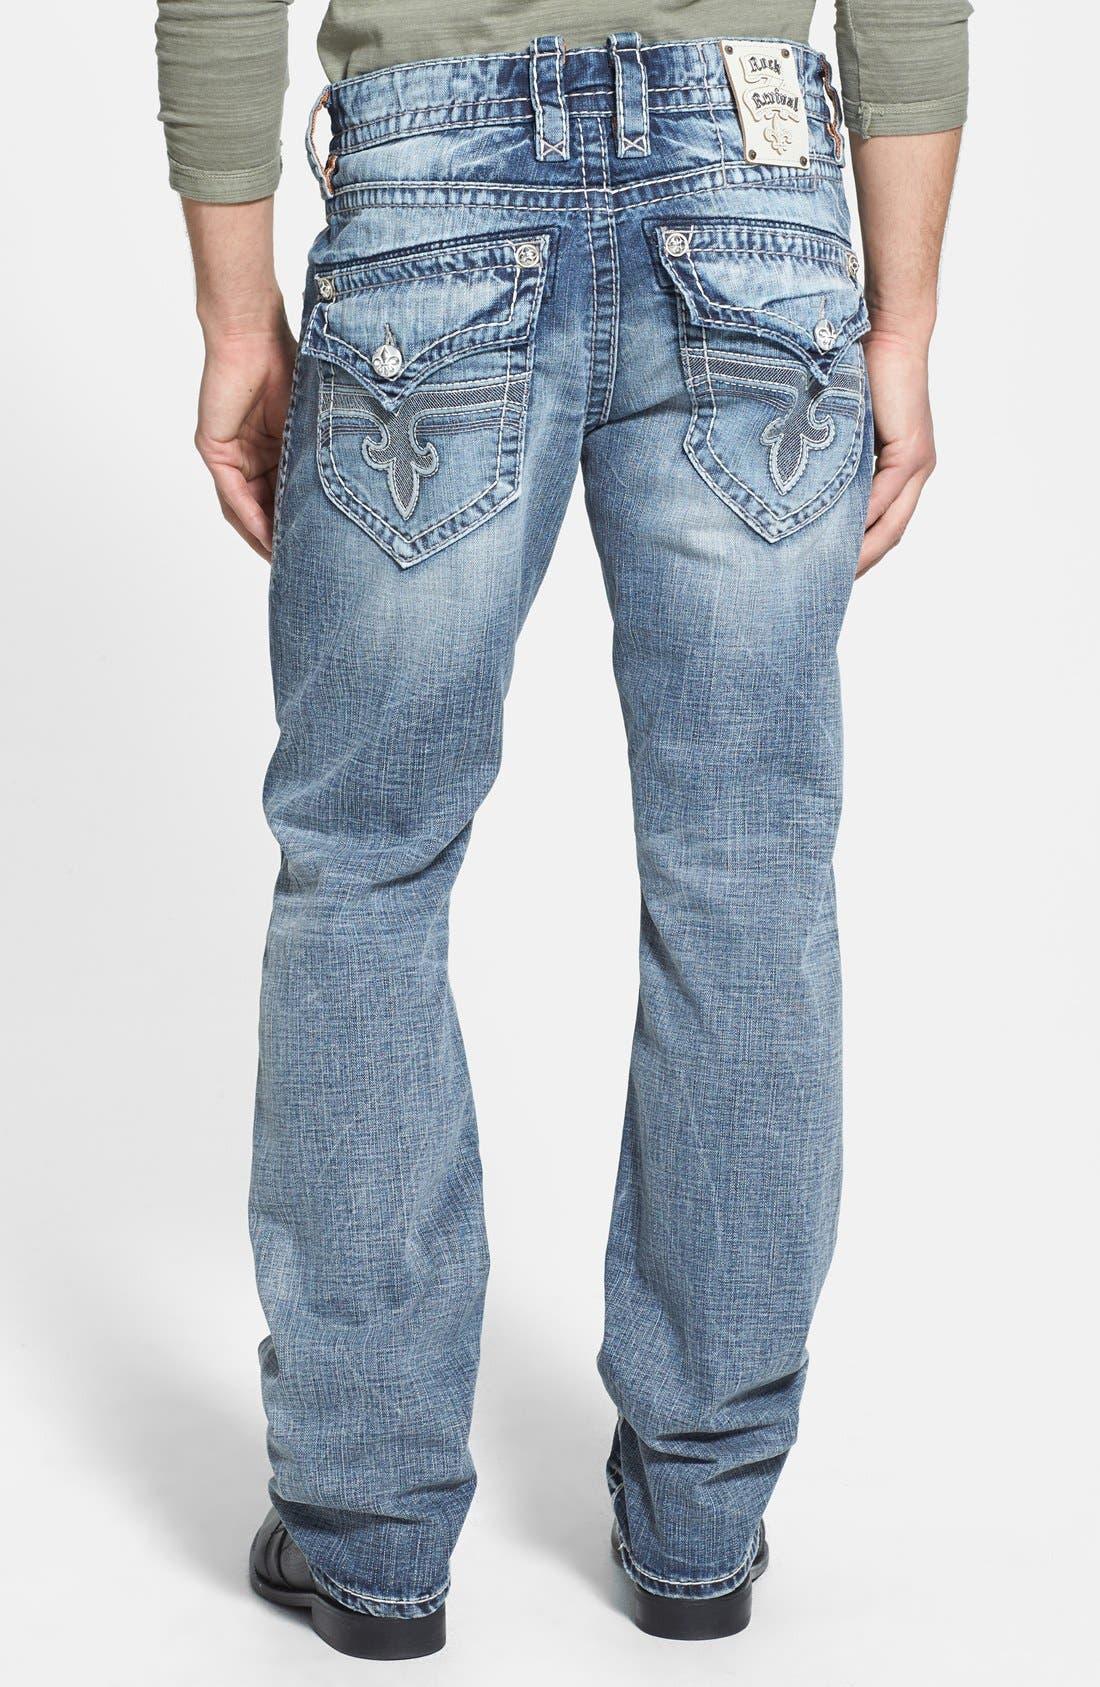 Alternate Image 1 Selected - Rock Revival 'Jed' Straight Leg Jeans (Light Blue)